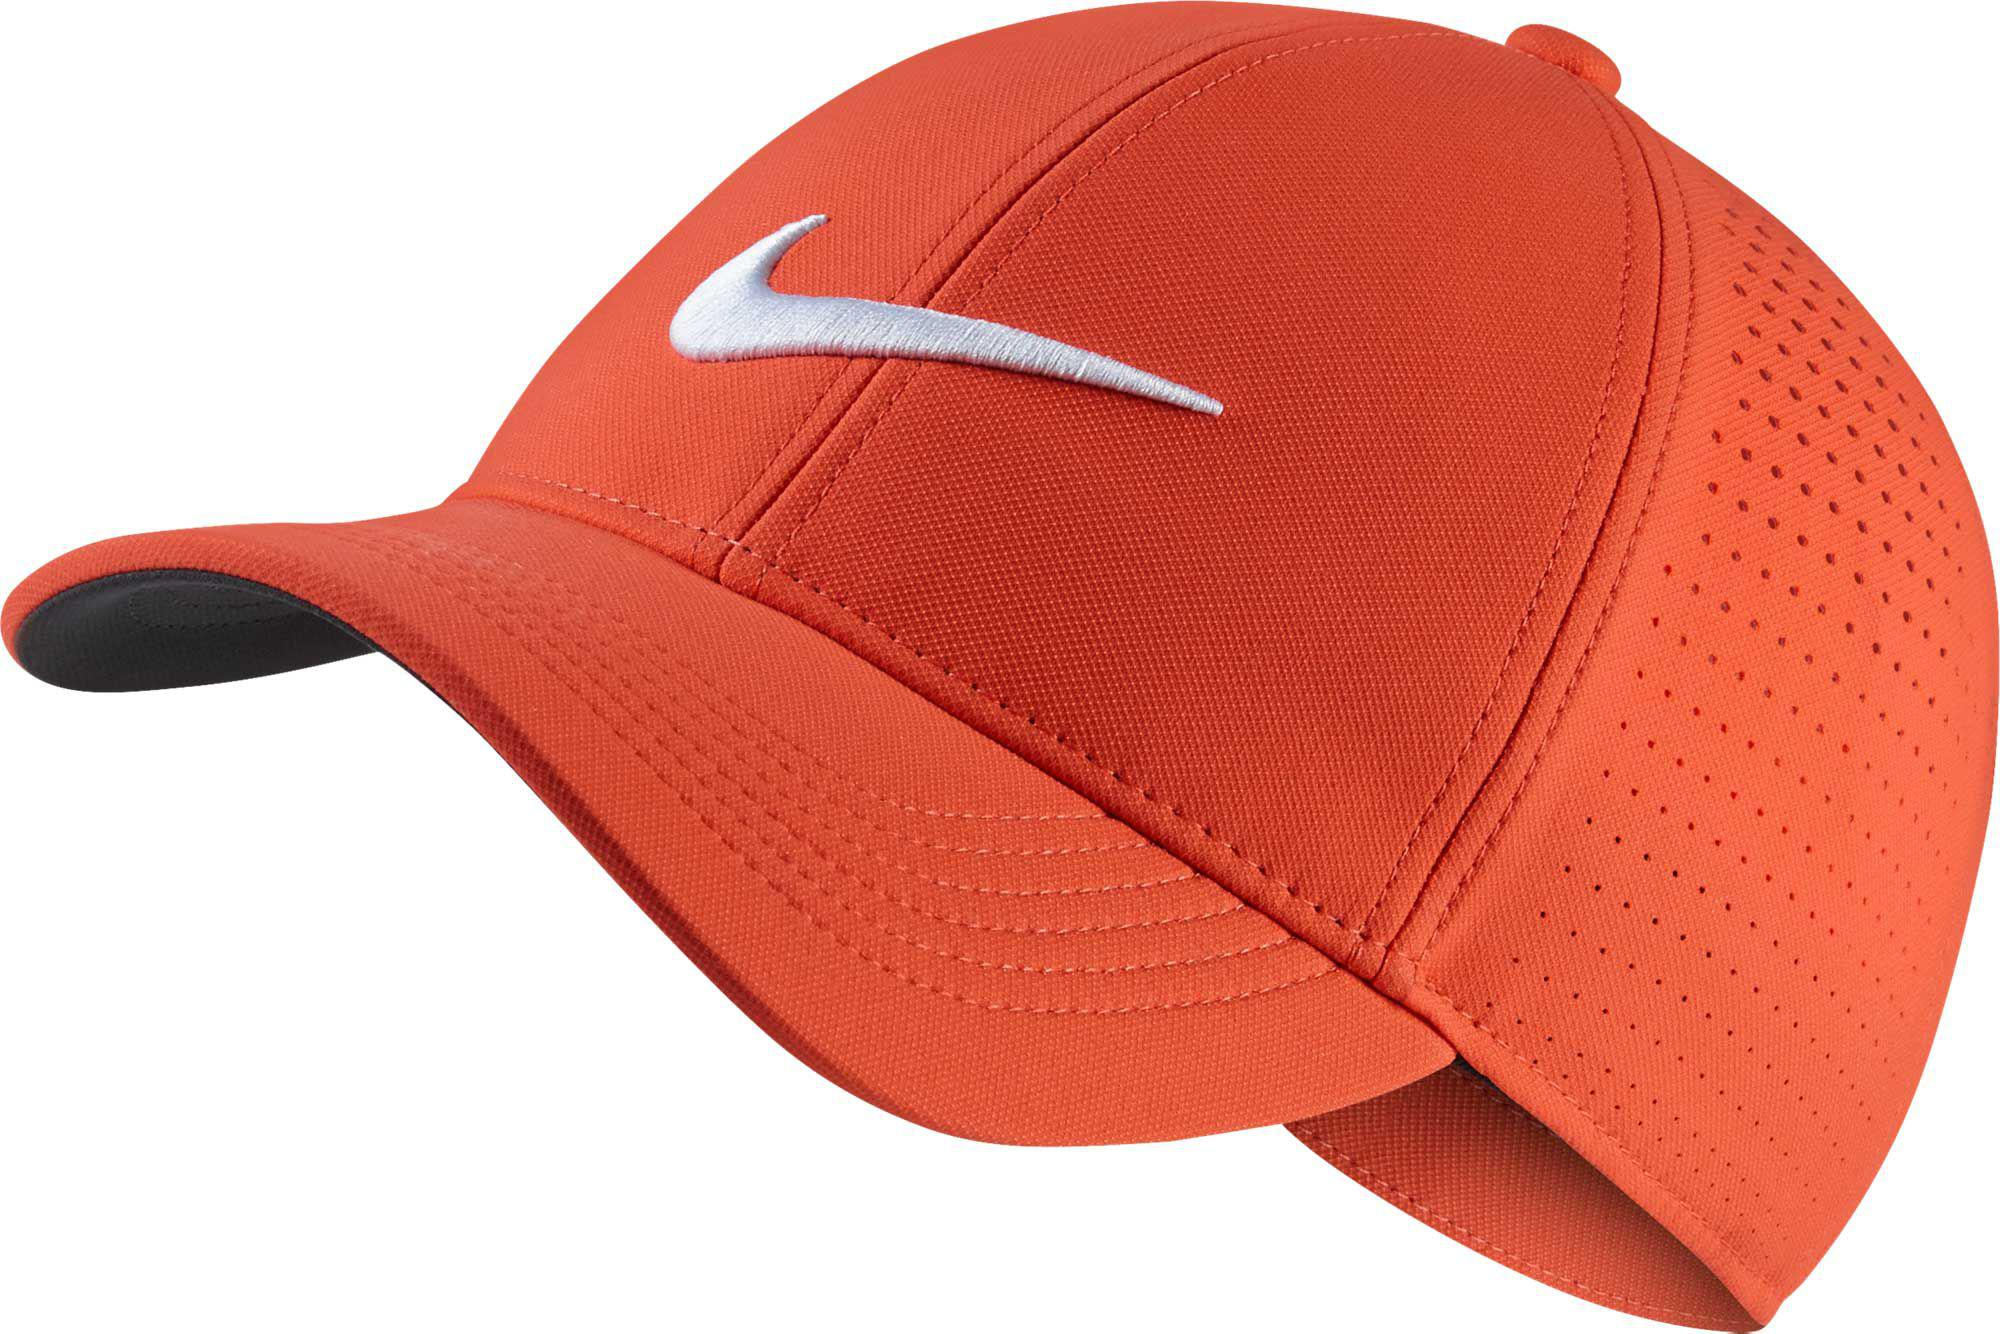 927db5bd082 Lyst - Nike Aerobill Legacy91 Perforated Golf Hat in Orange for Men